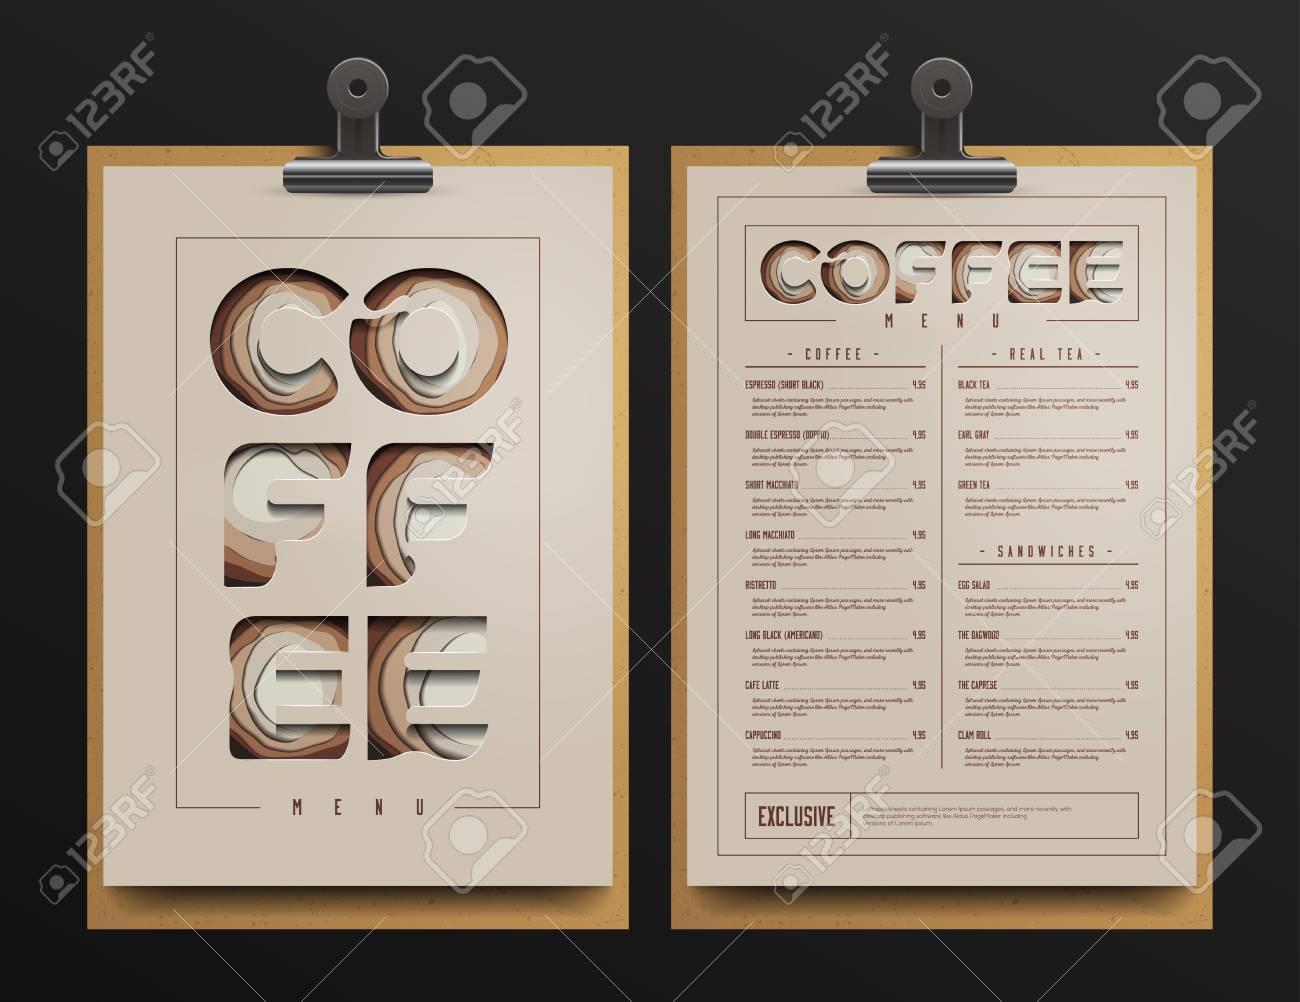 Coffee Shop Menu Template. Coffee Menu Cart Mock Up. Vector Illustration.  Stock Vector